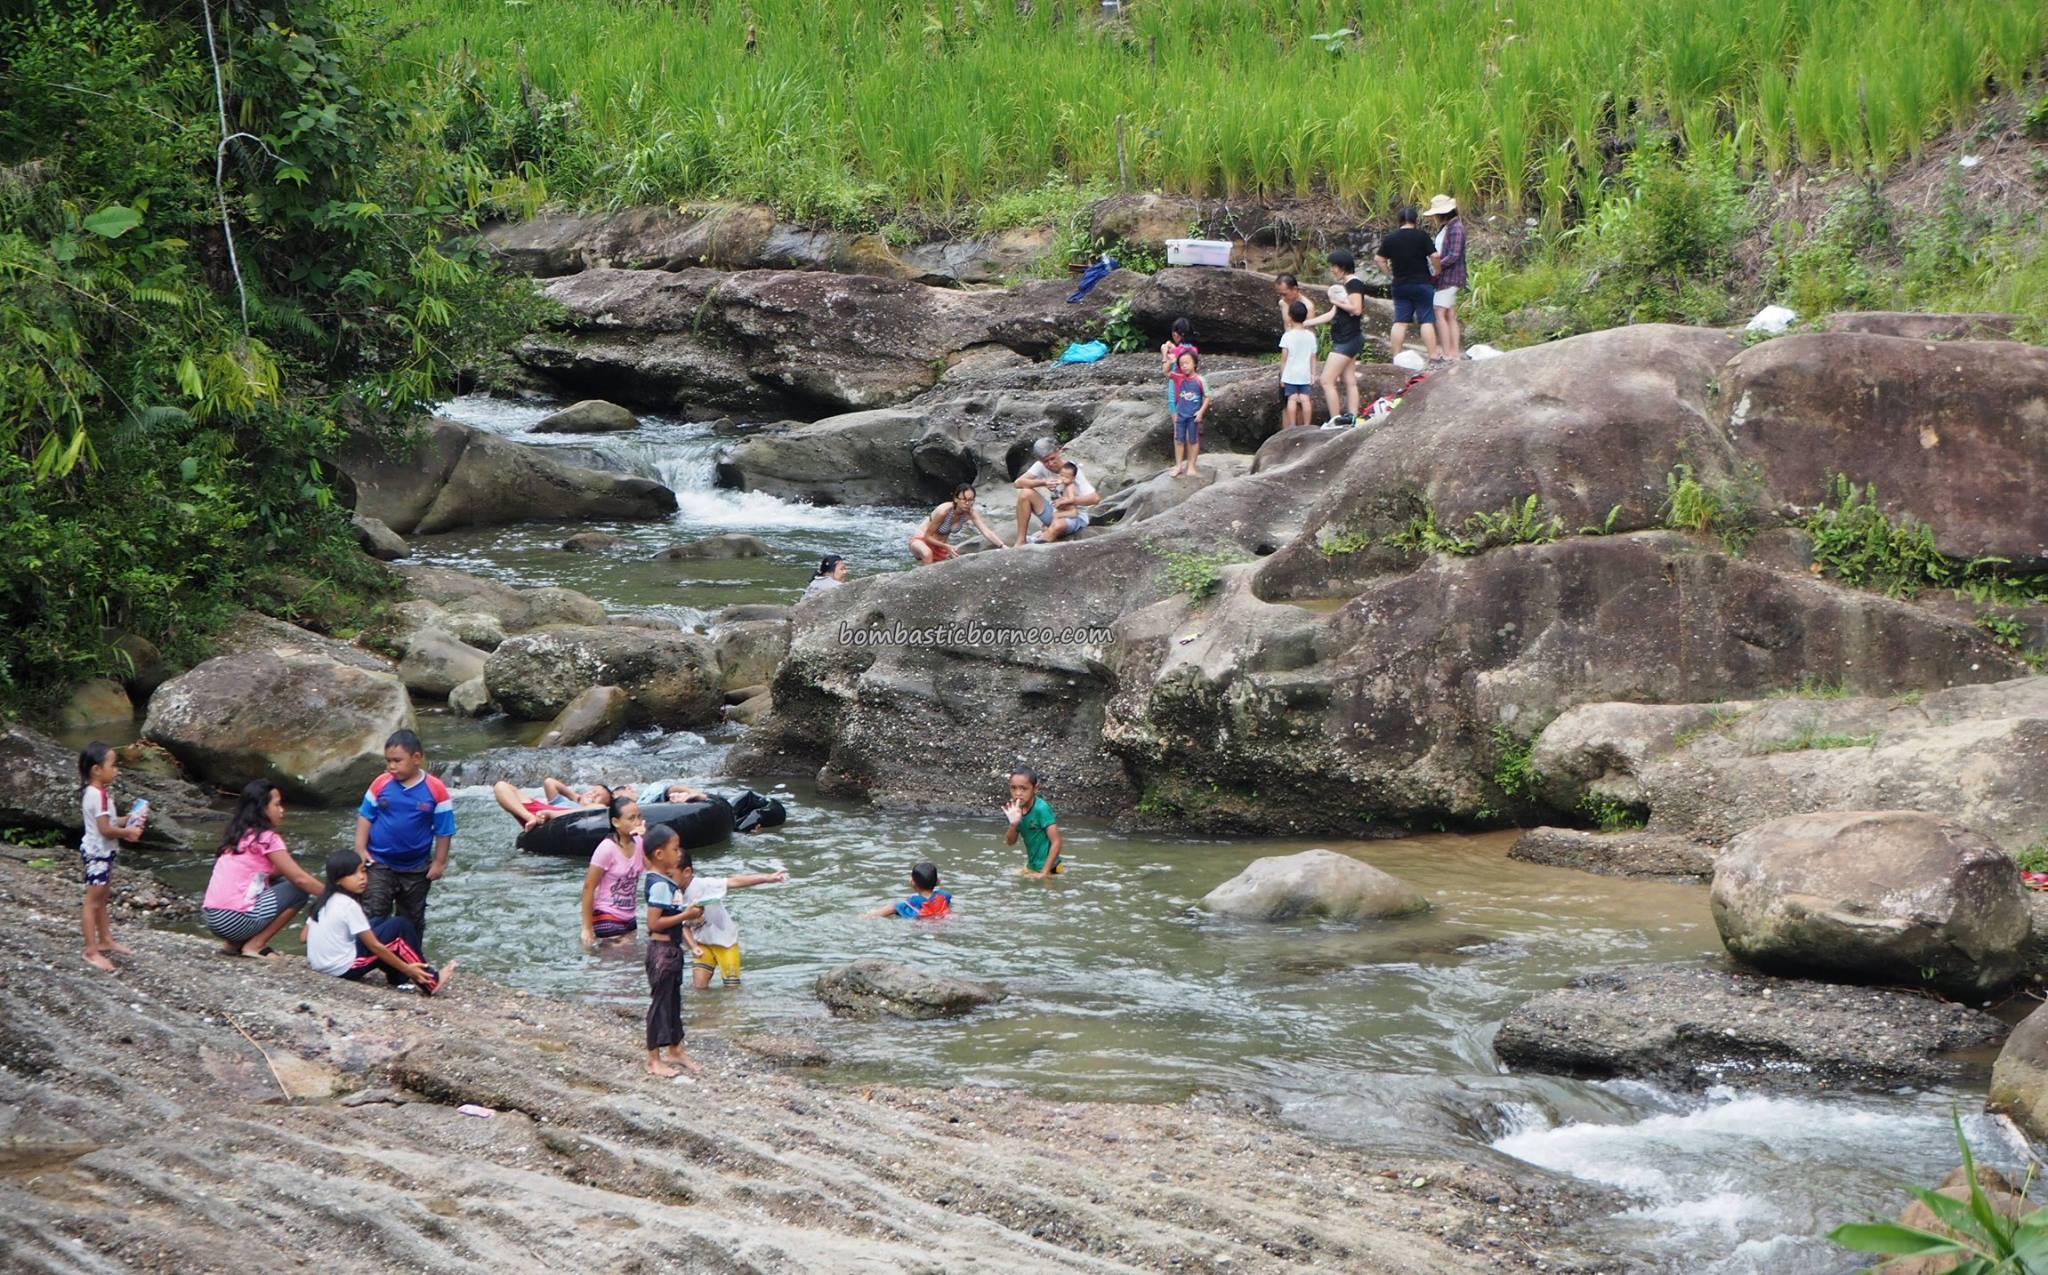 picnic spot, nature, outdoor, indigenous, Sapit River, Highlands, Kuching, Padawan, Malaysia, Community Service, native, tribe, Non Profit Organization, 沙捞越, volunteer,